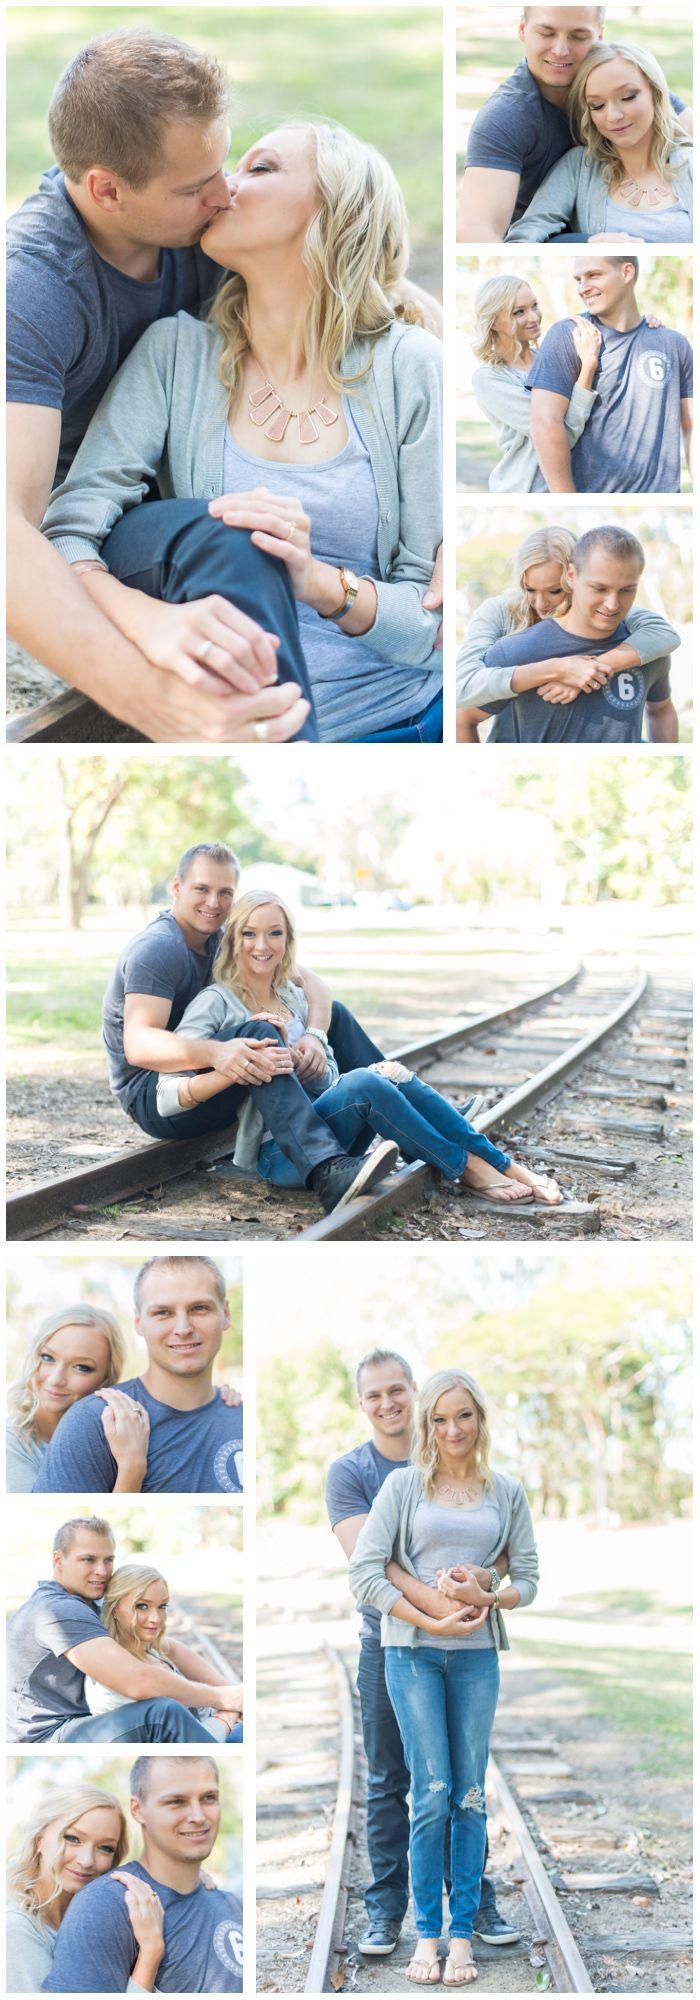 #picnic #garden #engagement #couple #love #bundaberg #Demin #blue #winter #golden